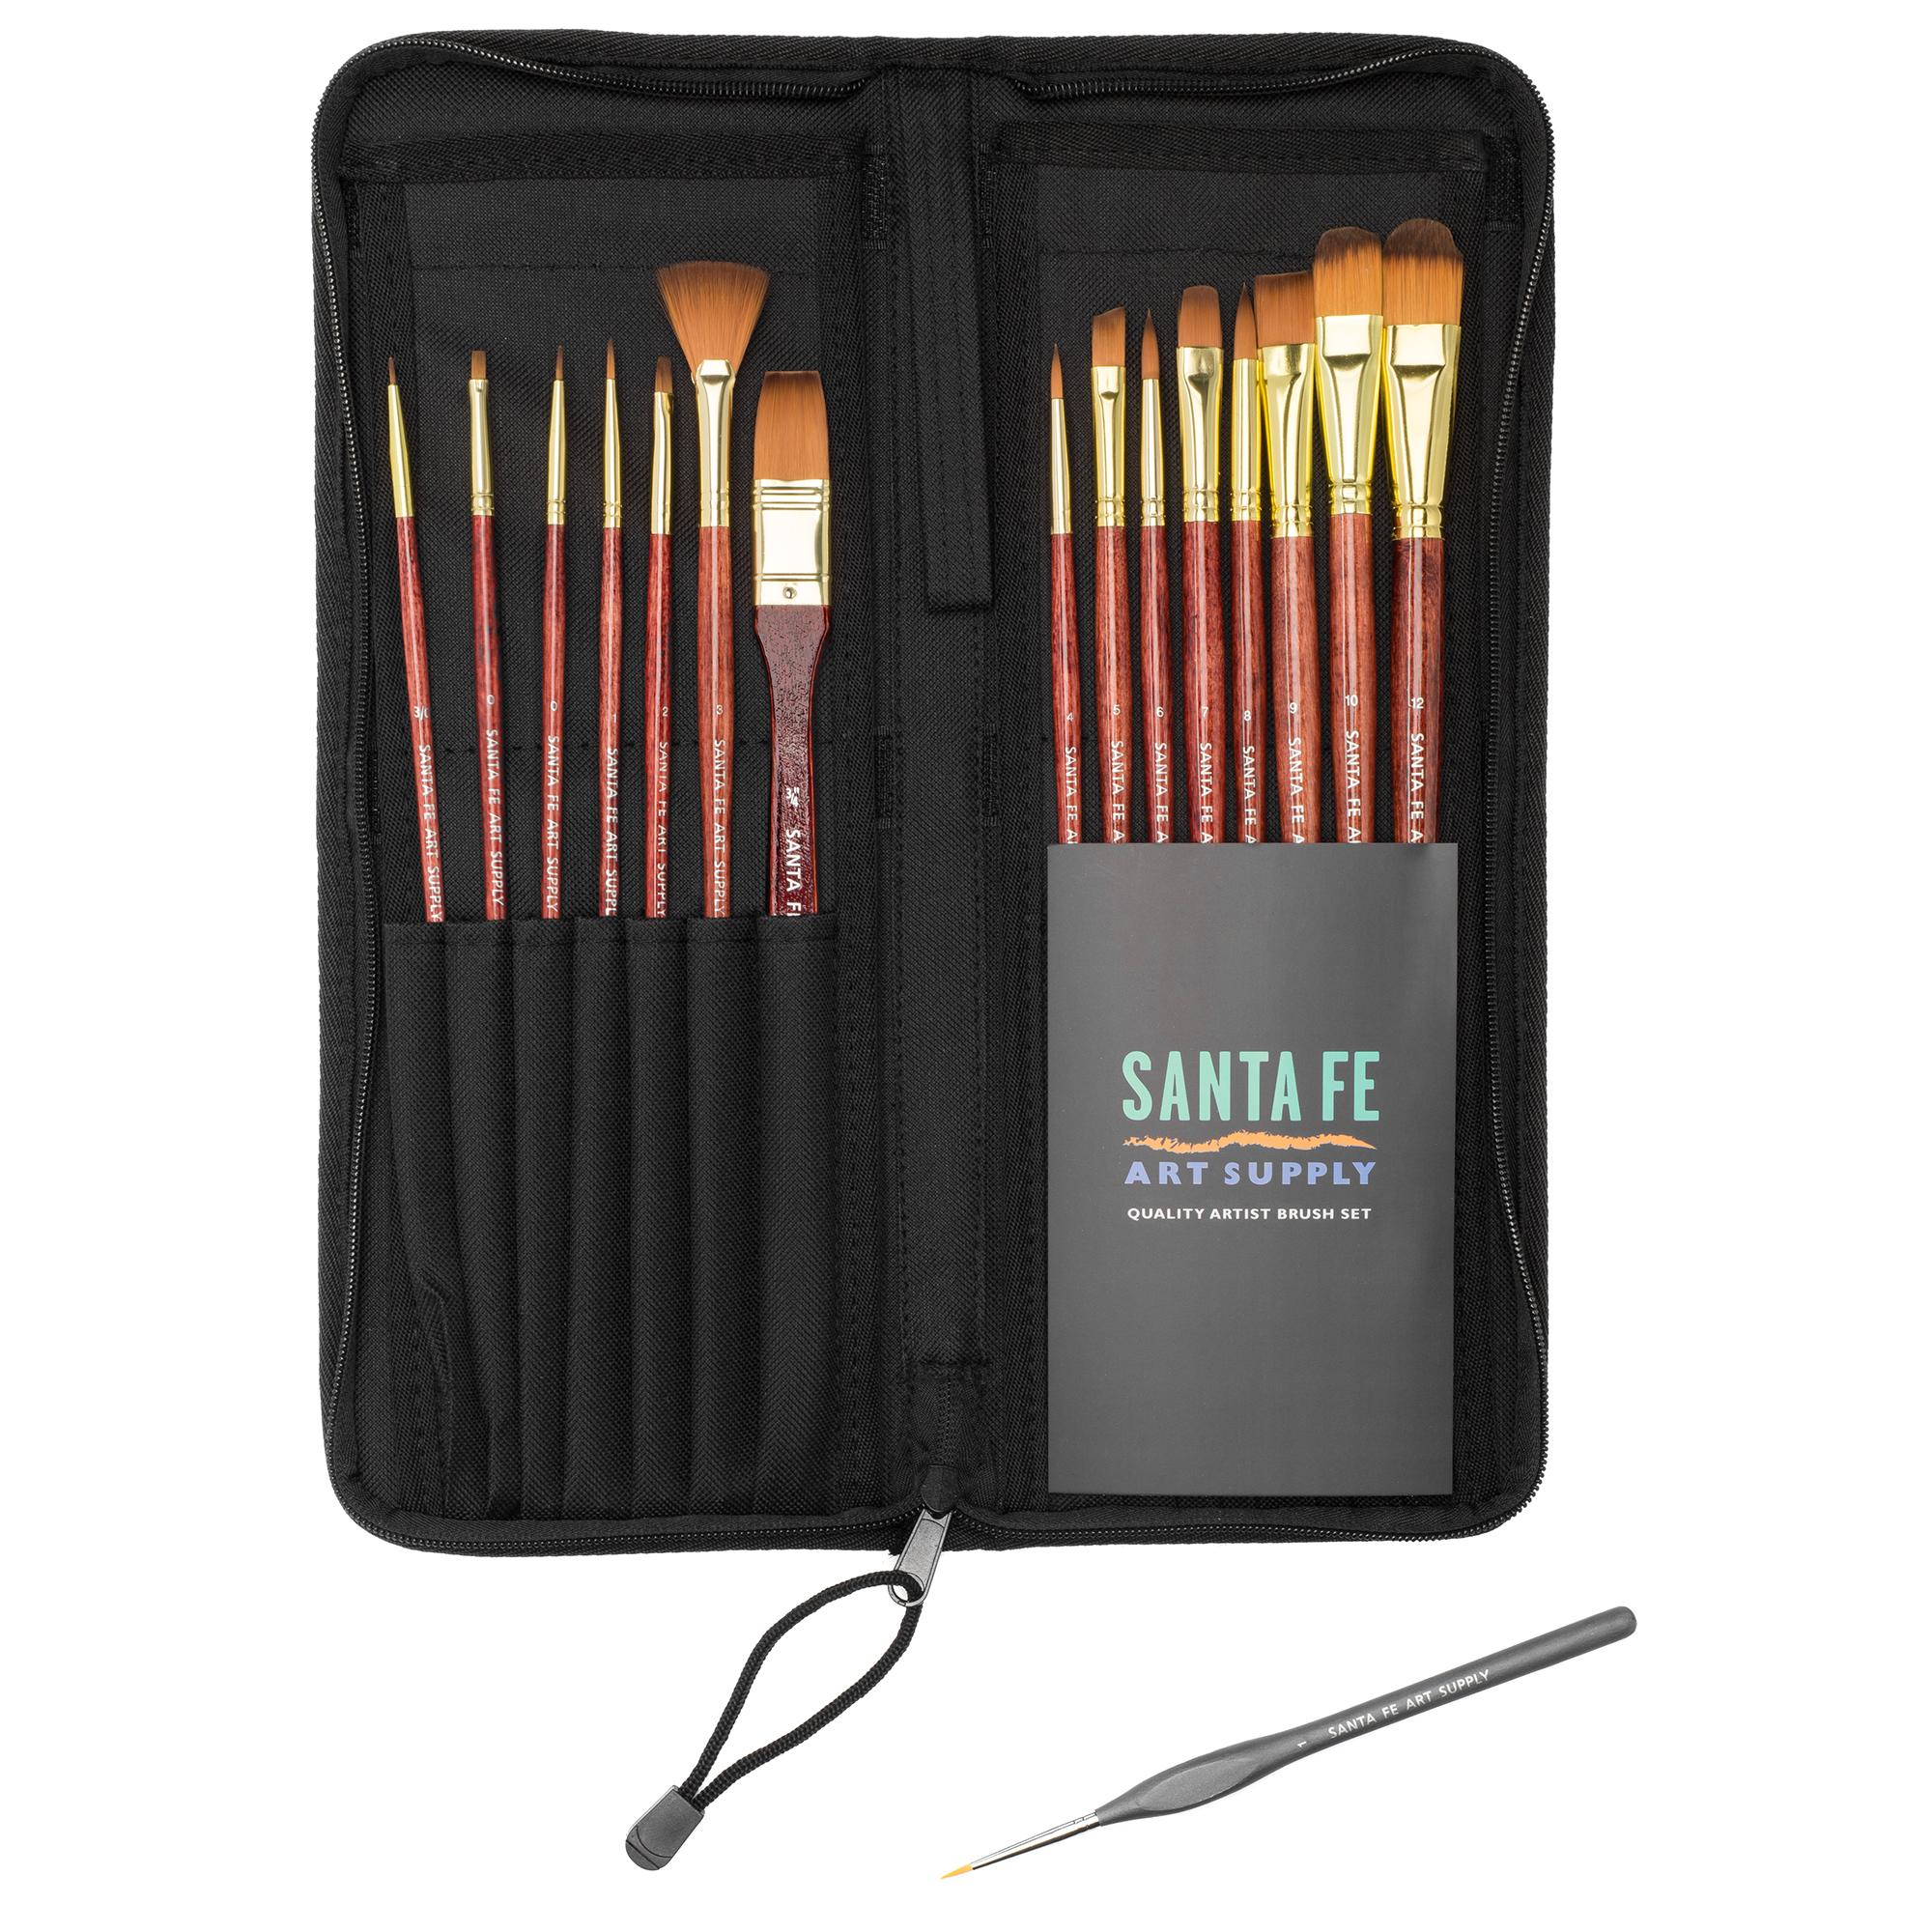 5 Santa Fe Art Supply Artist Brush Set